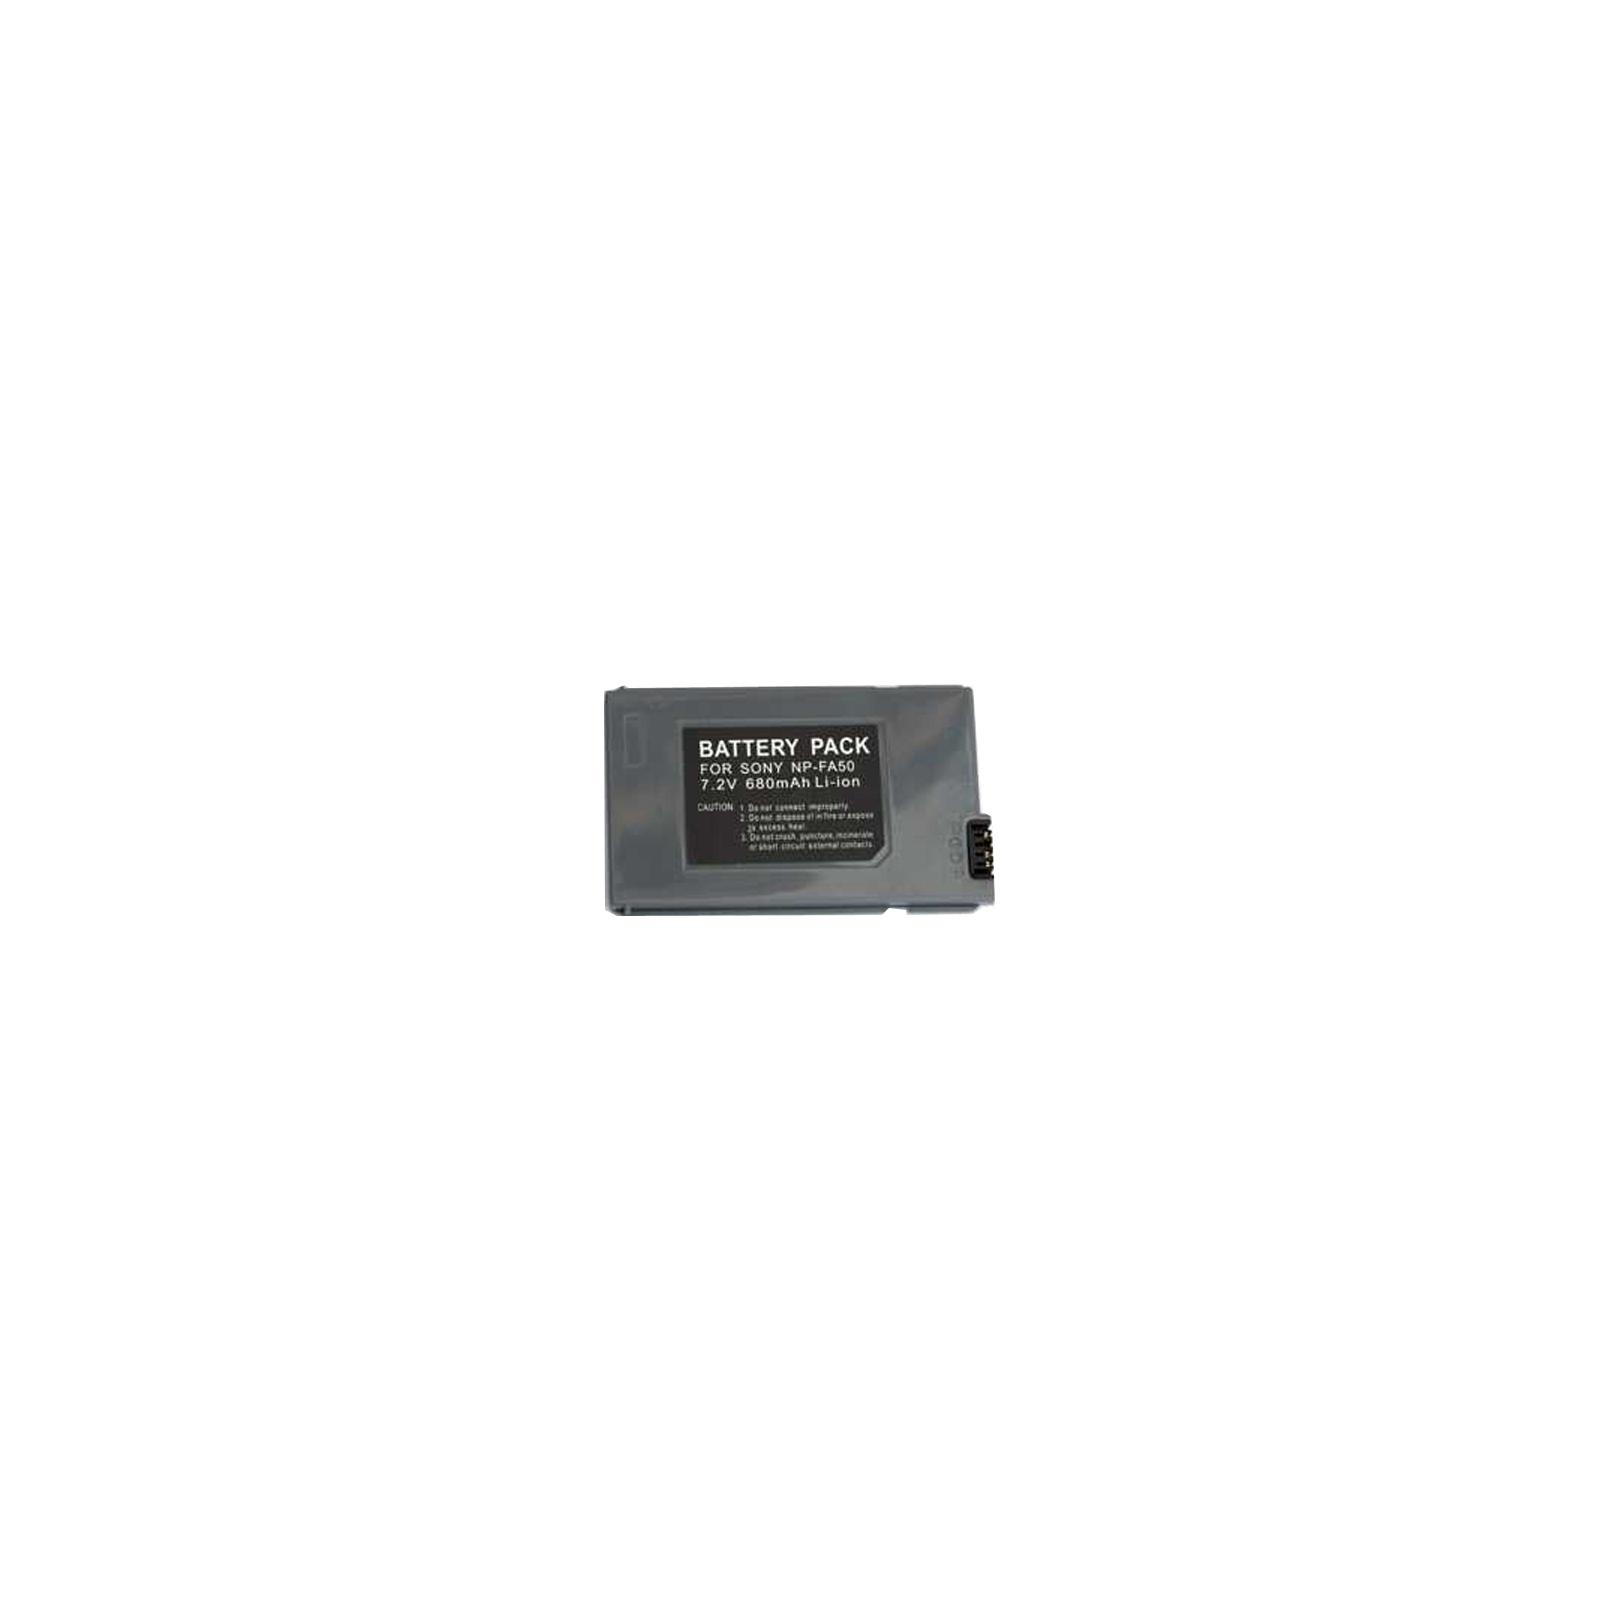 Аккумулятор к фото/видео PowerPlant Sony NP-FA50 (DV00DV1064)